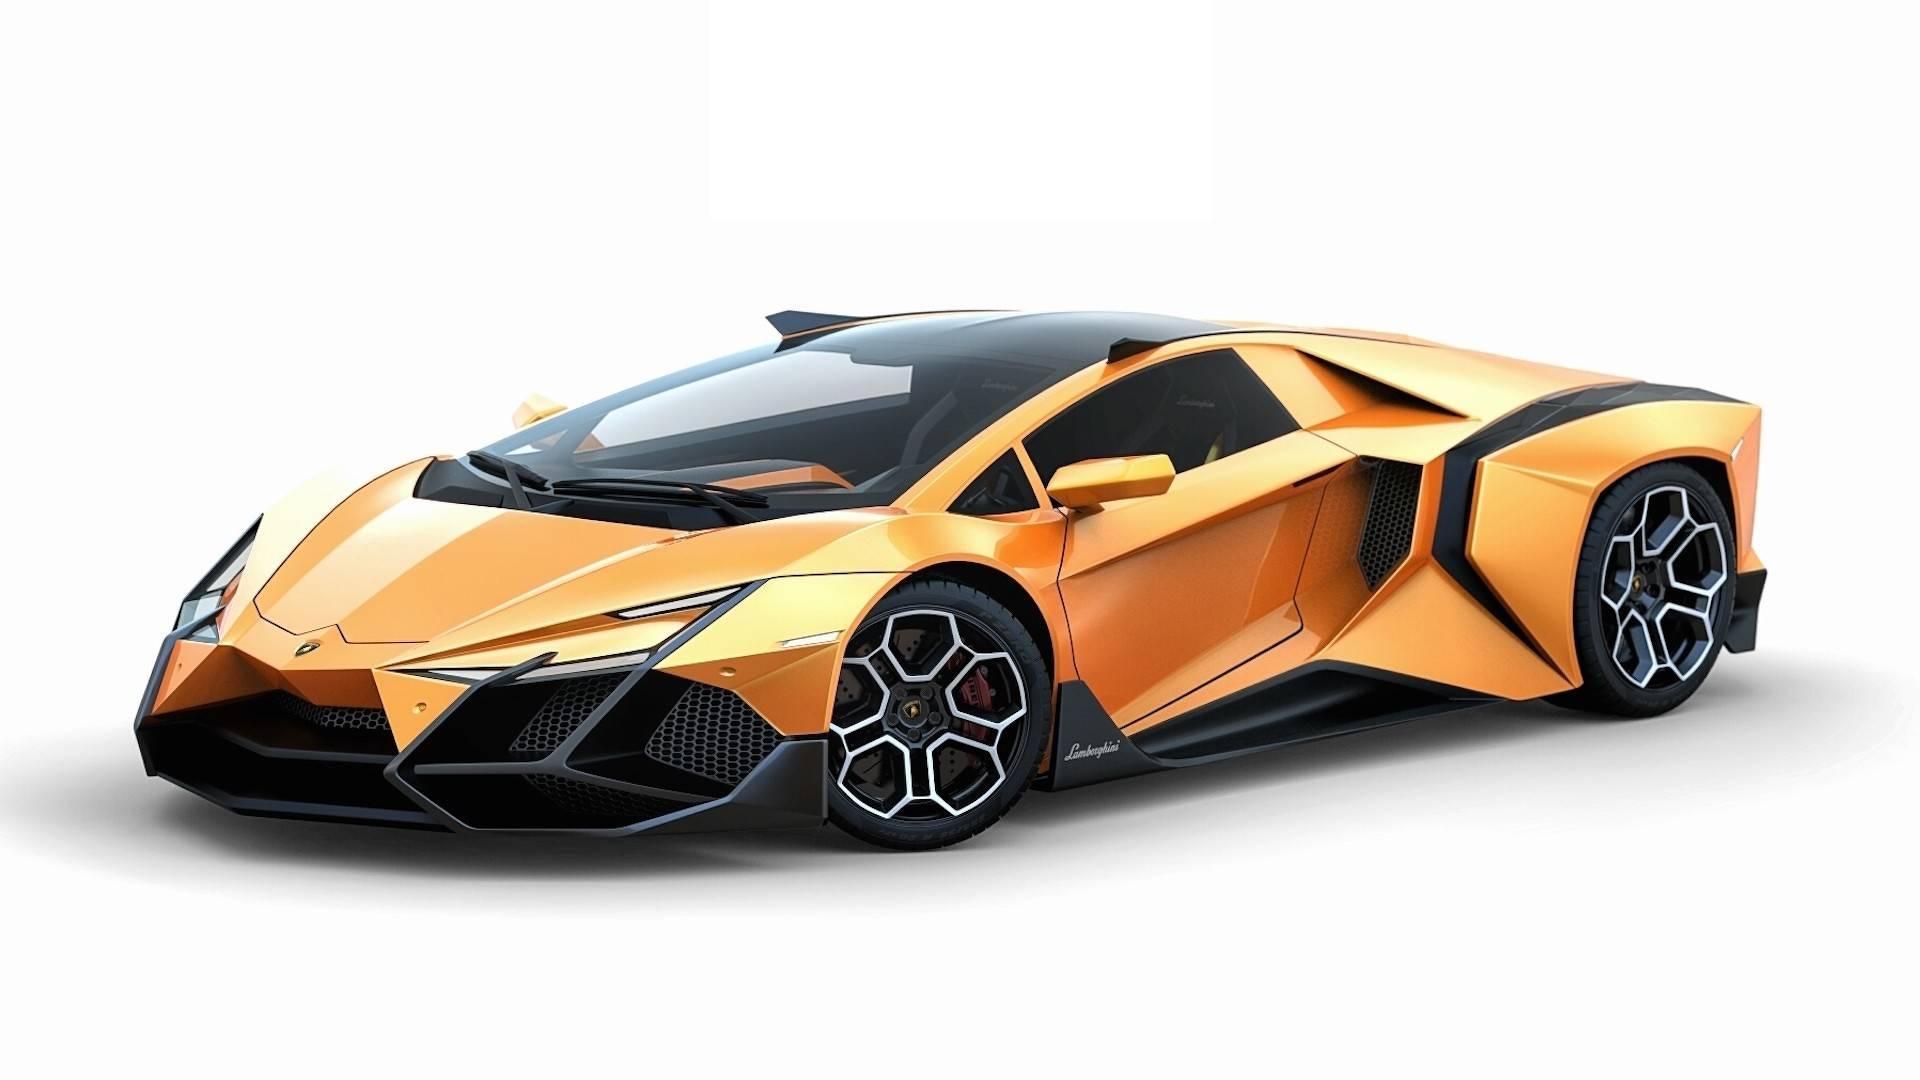 Lamborghini Forsennato Hypercar Is Edgy Even By Italian